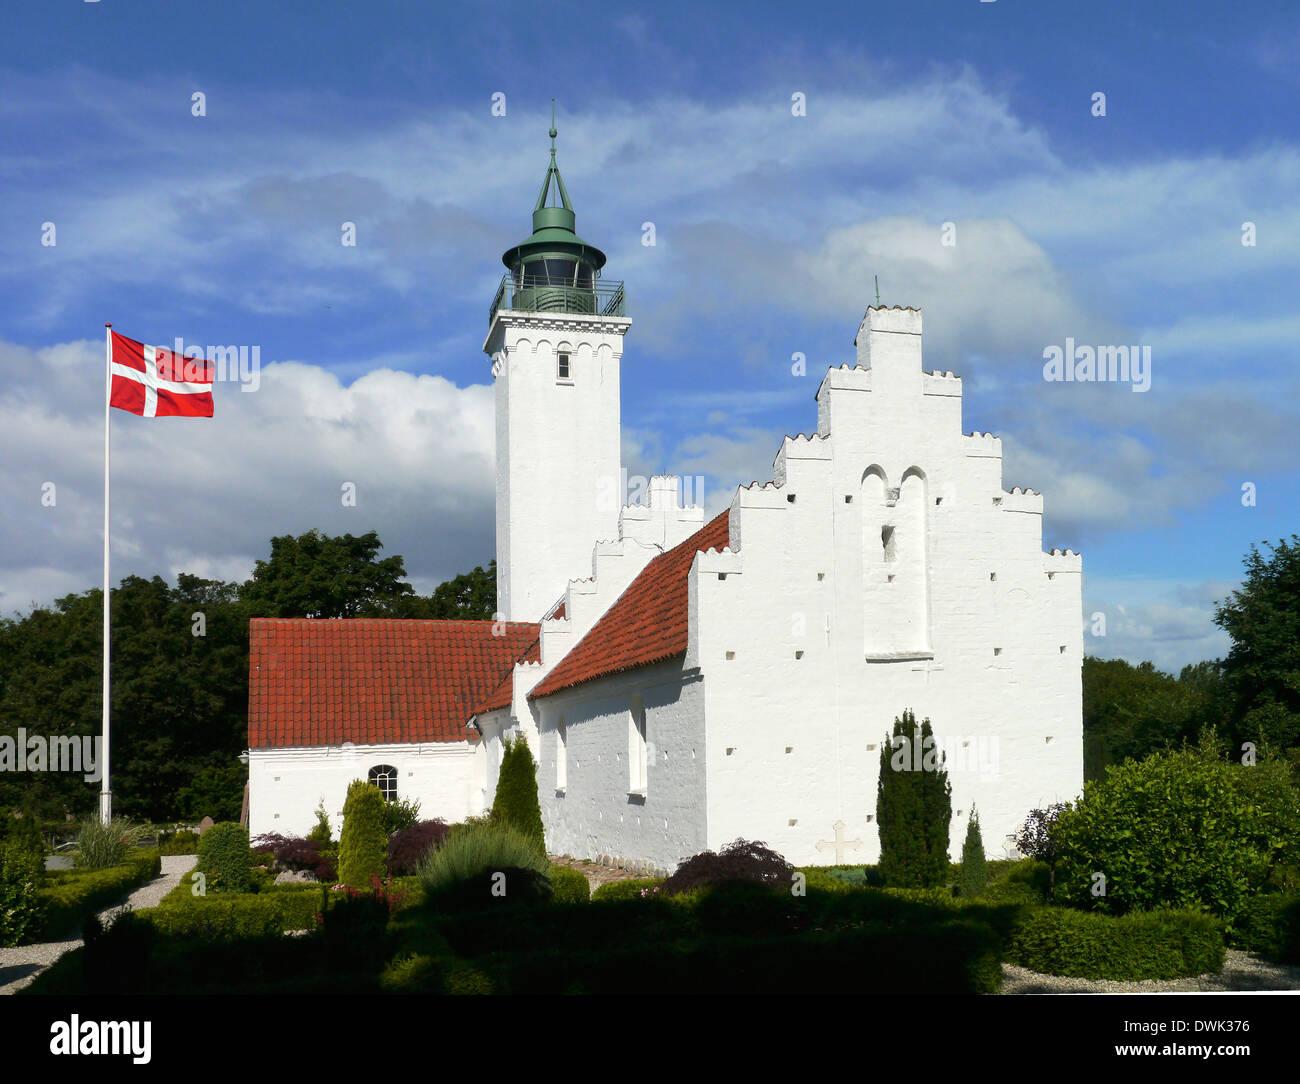 lighthouse and church of tunø, denmark - Stock Image